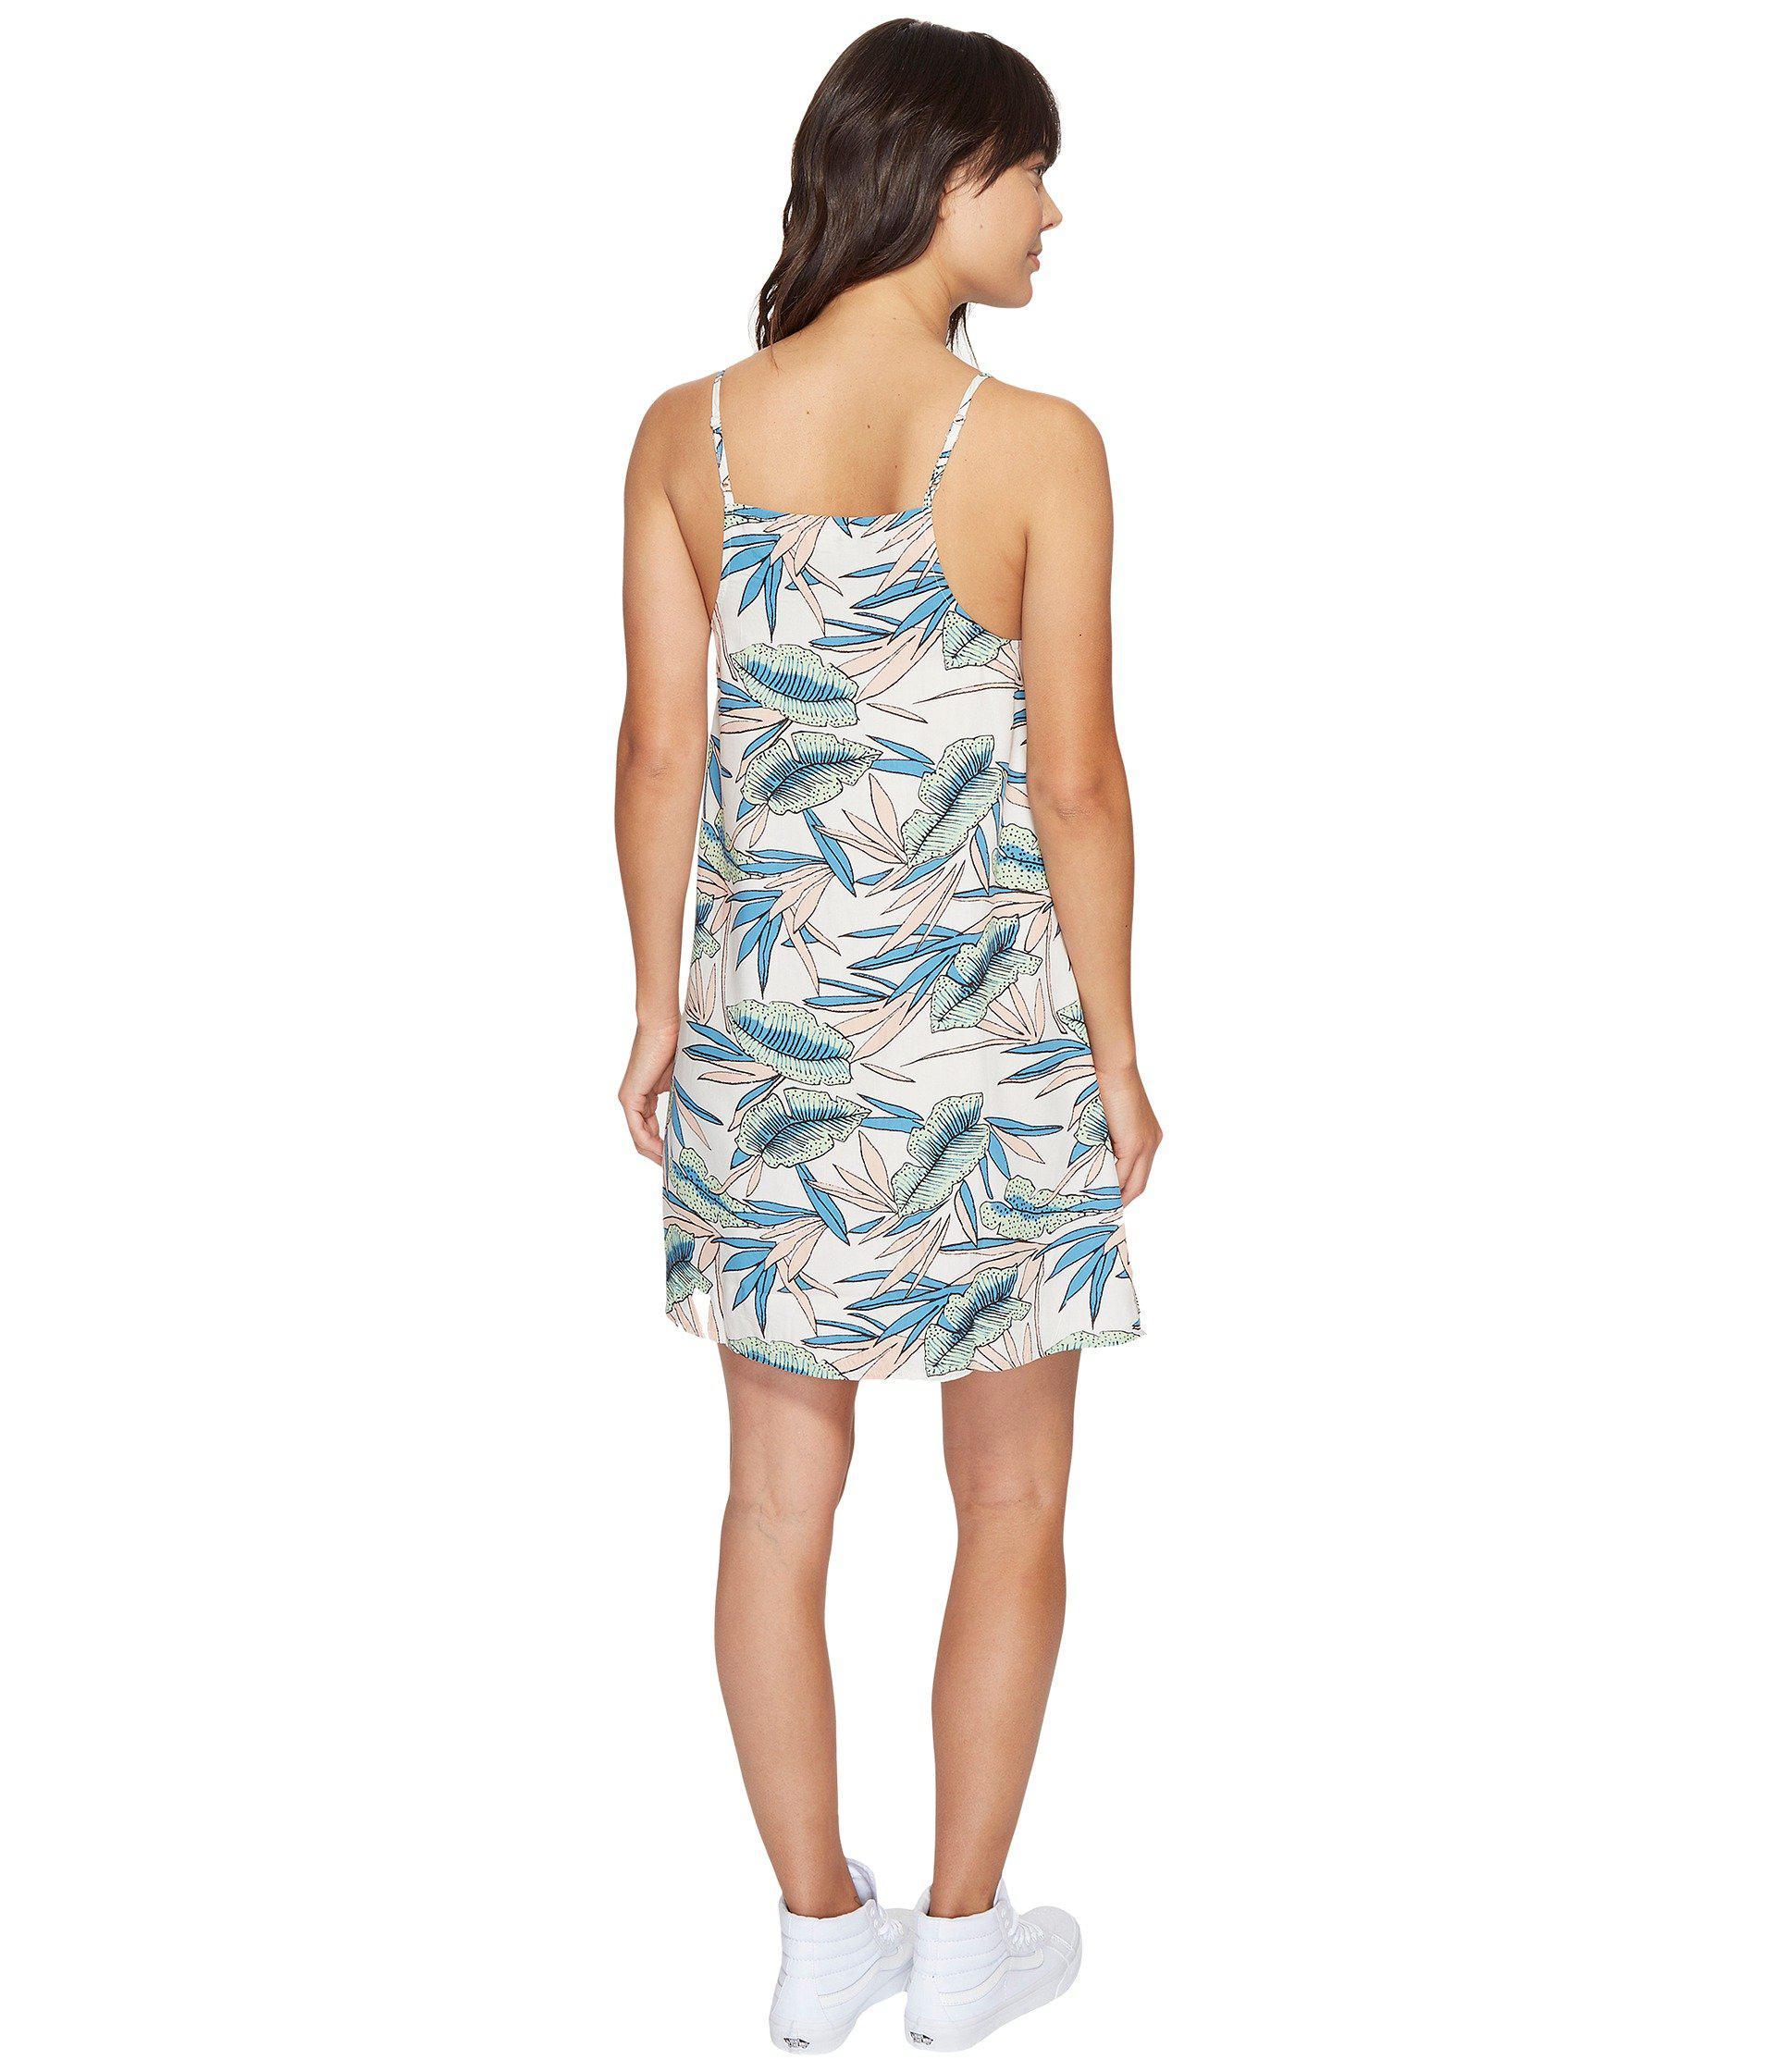 22142790a8ca4c Lyst - Vans Marie Ii Dress in Blue